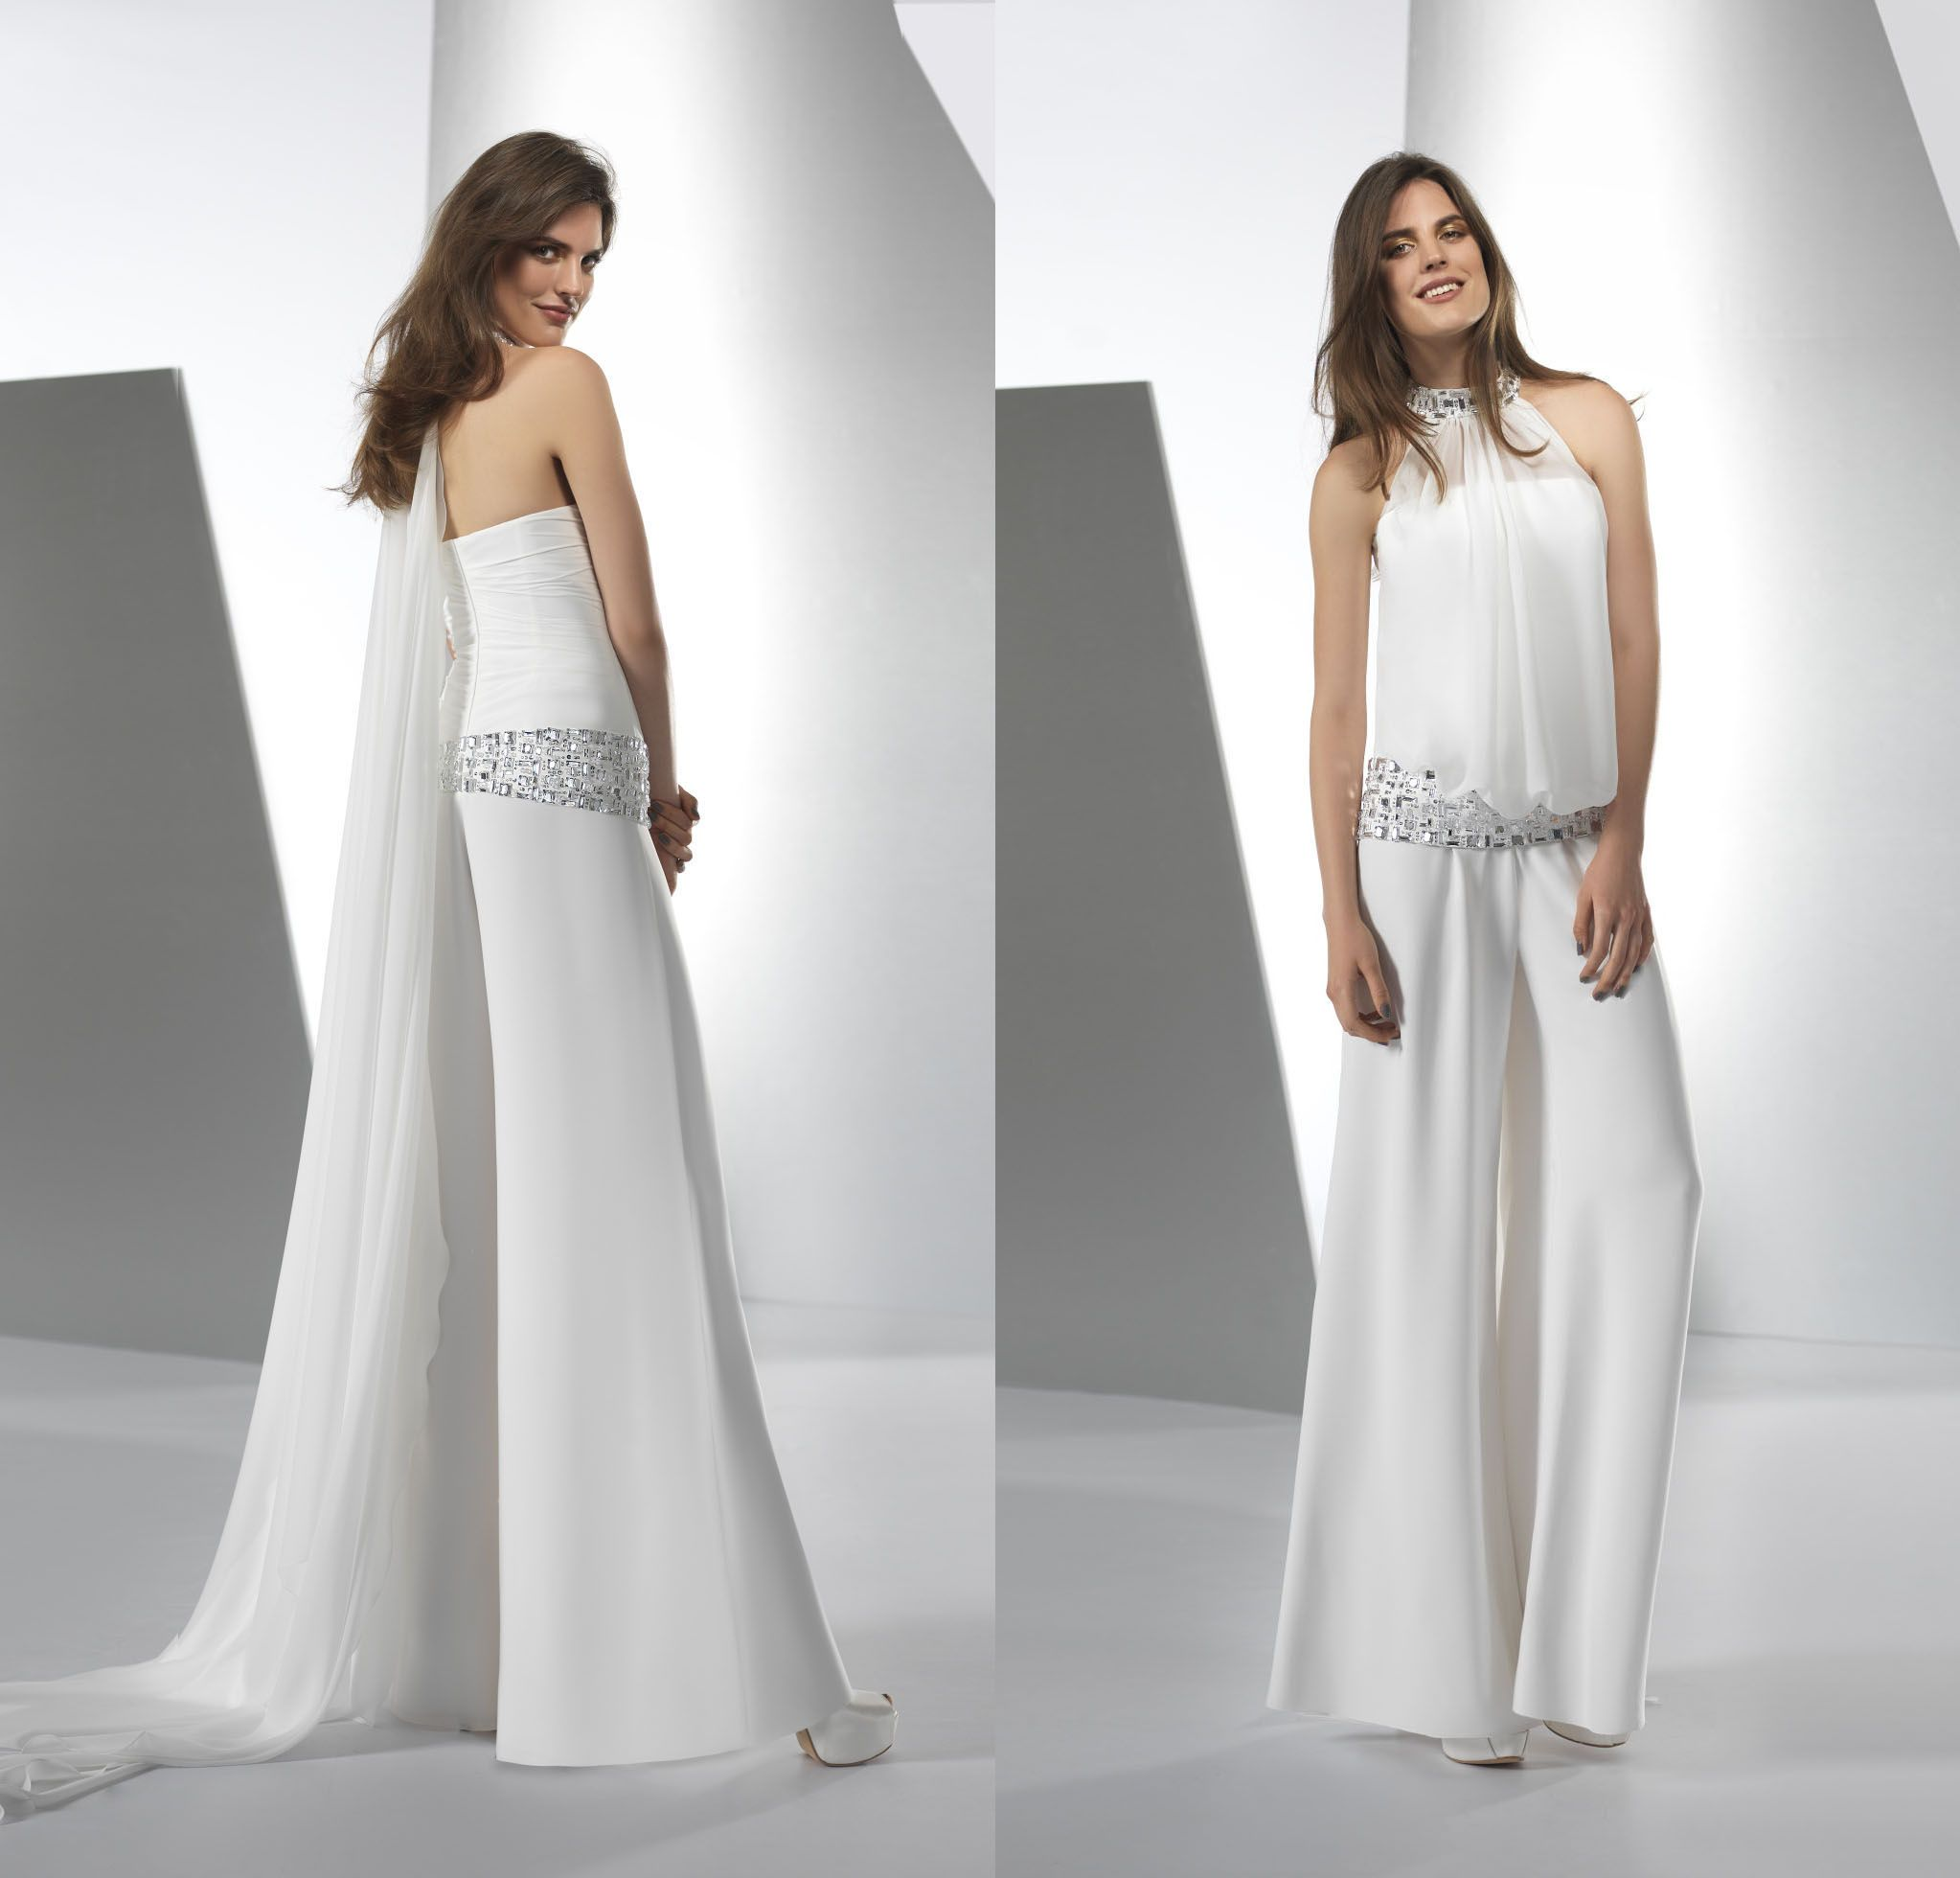 Valentini Spose - bridal pant suit | If We Do It Again | Pinterest ...